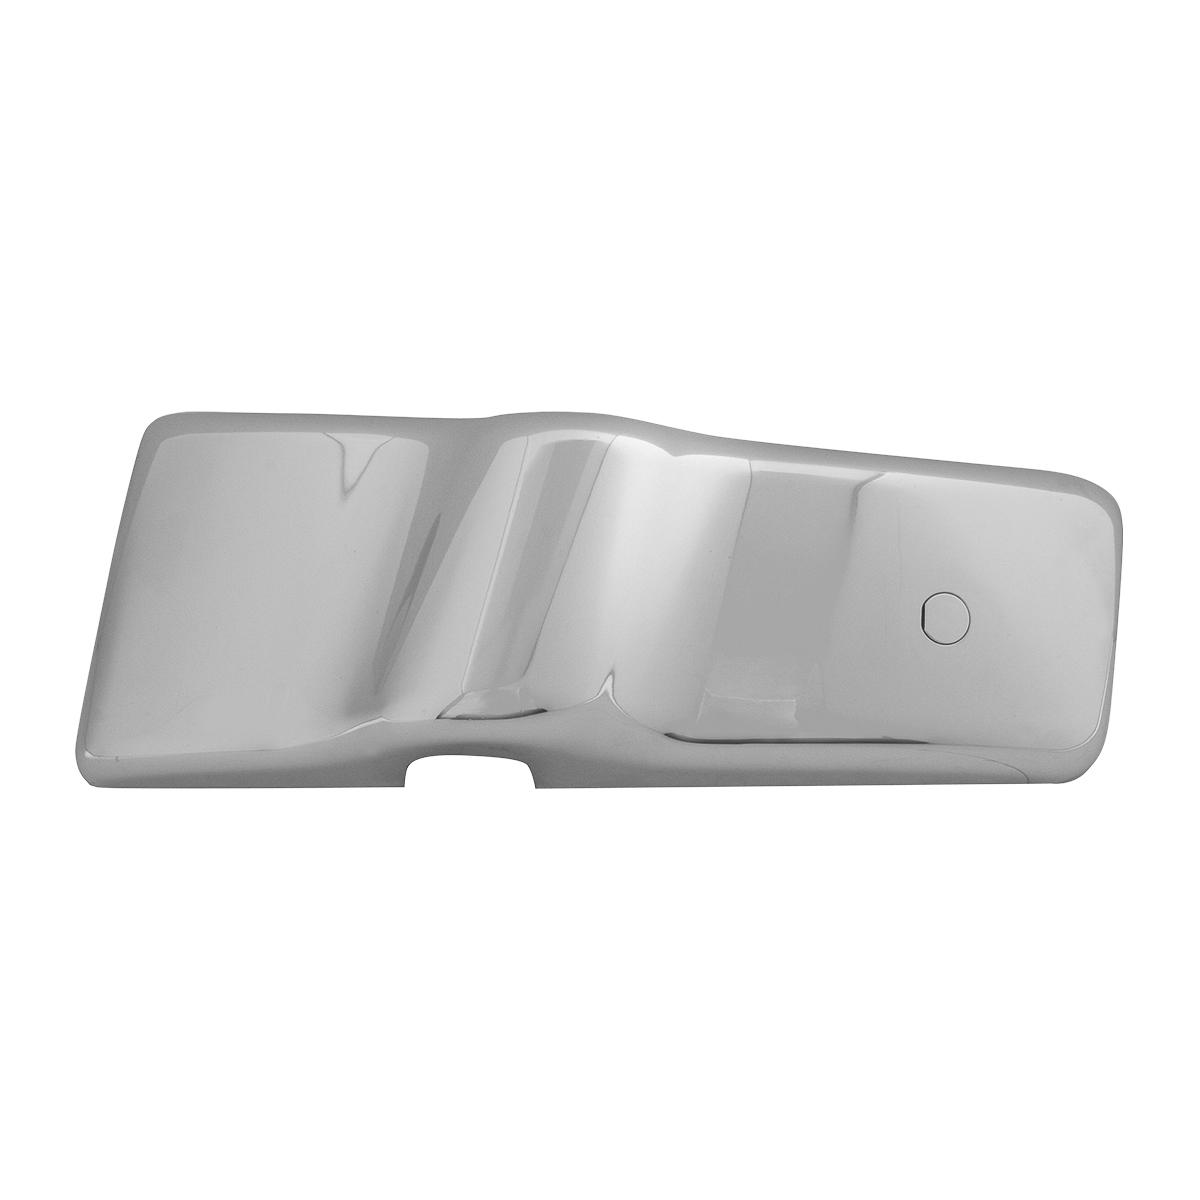 67812 Chrome Plastic Exterior Door Mirror Bracket Cover for Freightliner